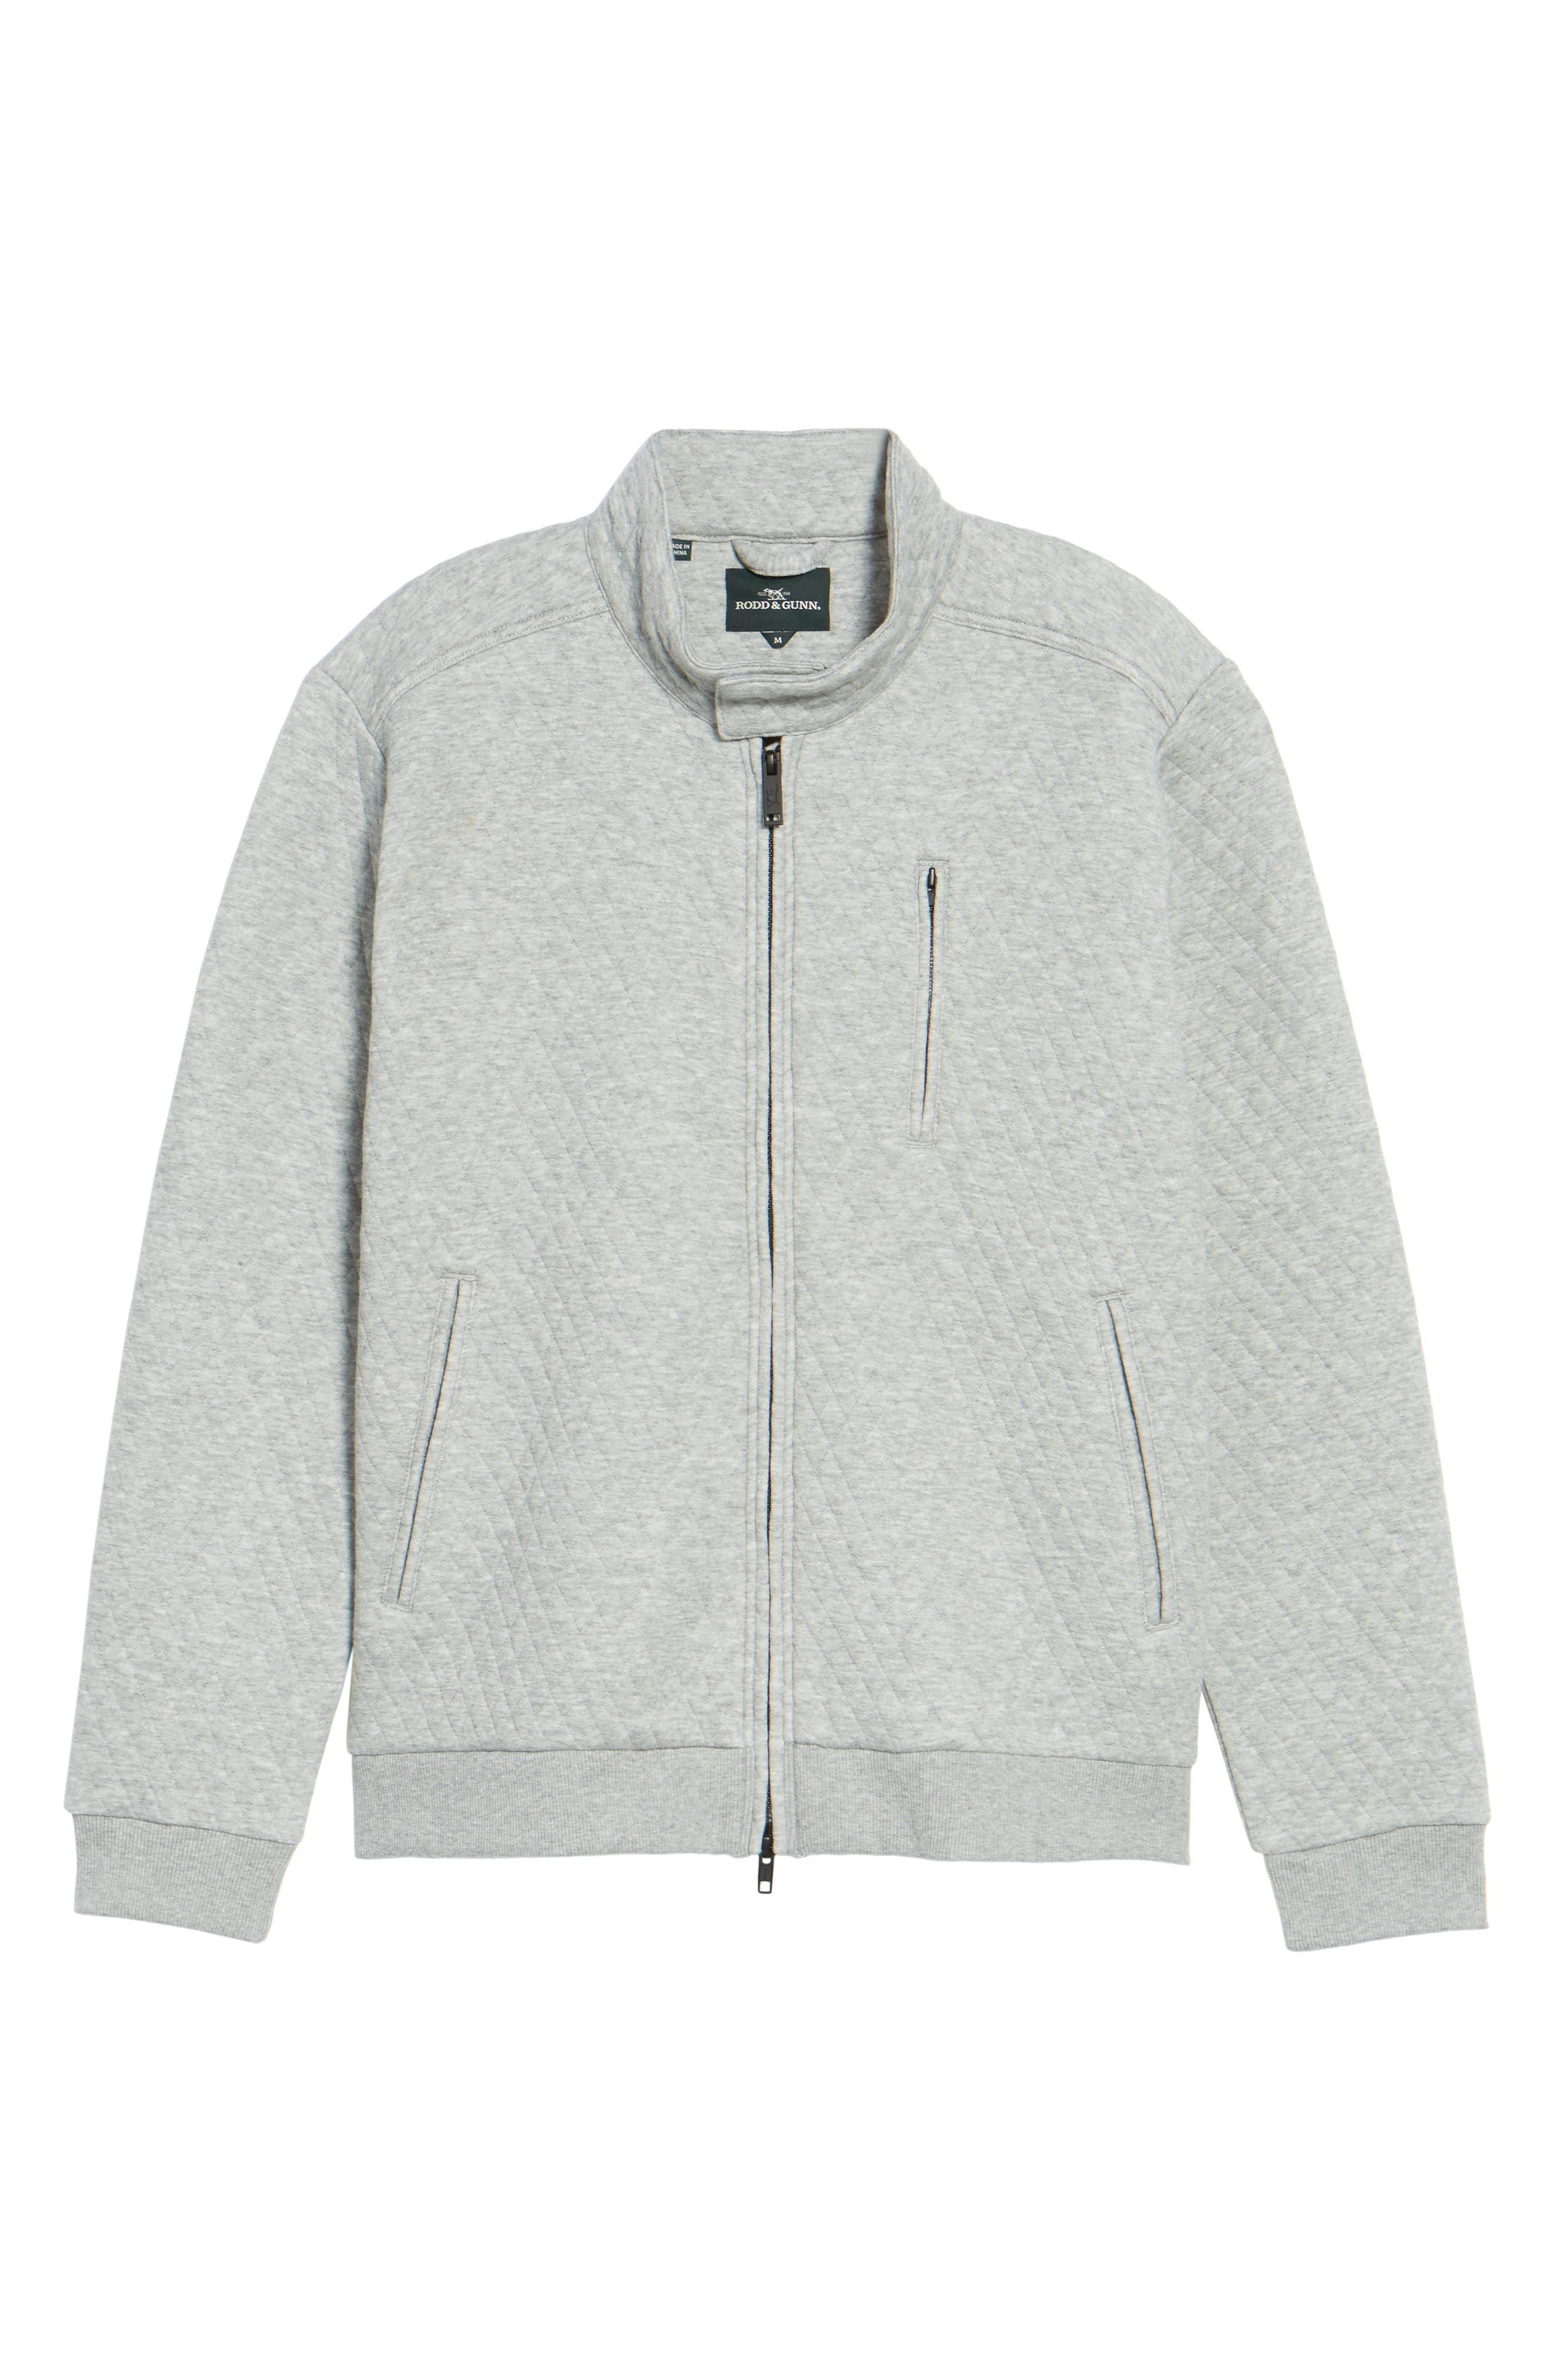 RODD & GUNN, Skipjack Pass Quilted Fleece Jacket, Alternate thumbnail 6, color, ASH